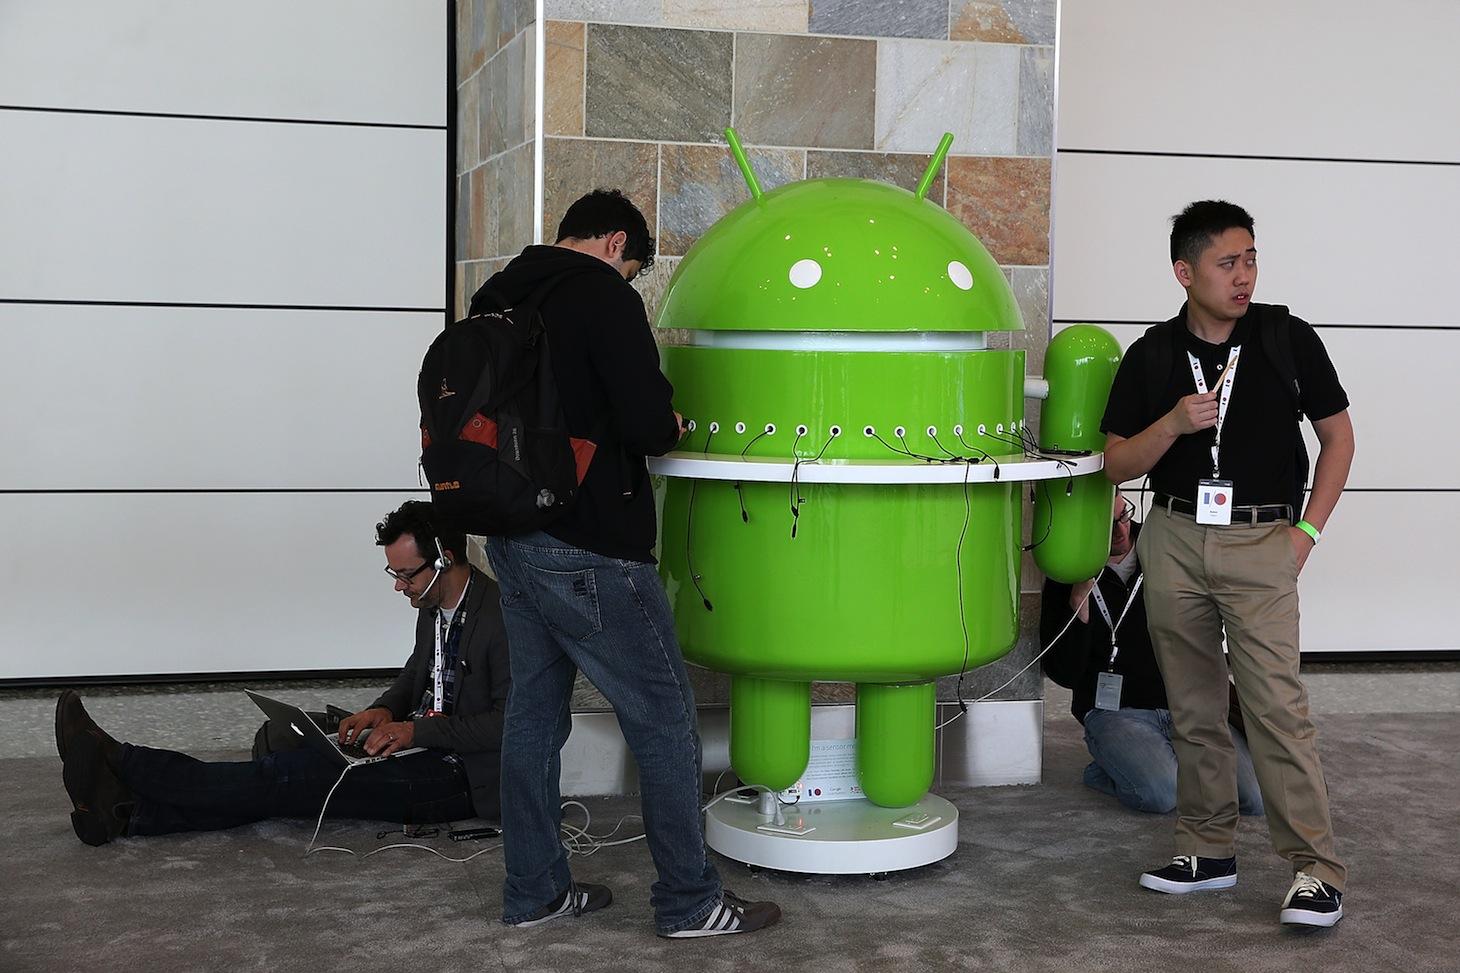 Opera, Yandex Start 'One Platform Foundation' For Android Devs